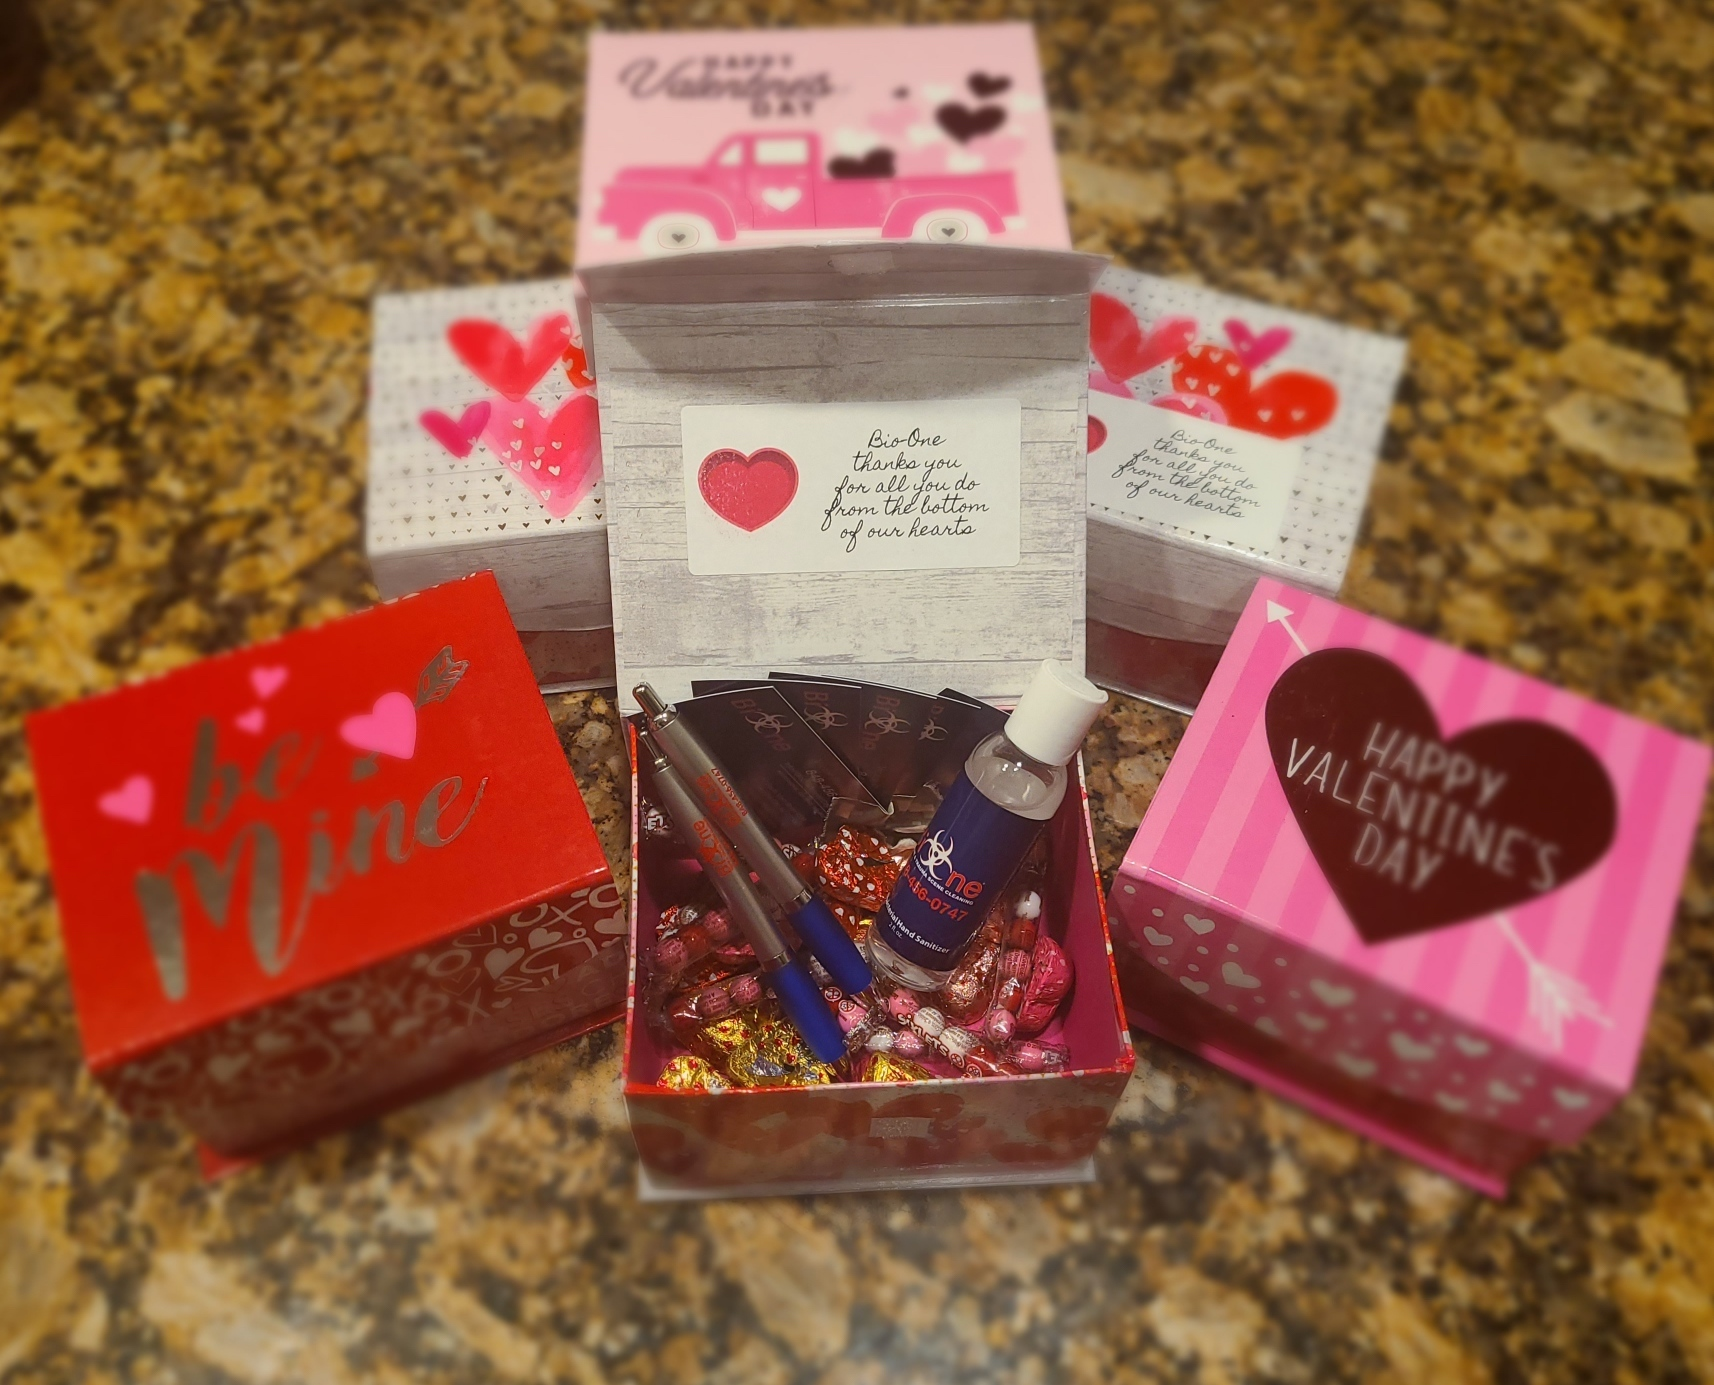 Bio-One Valentine's Day Gift Boxes